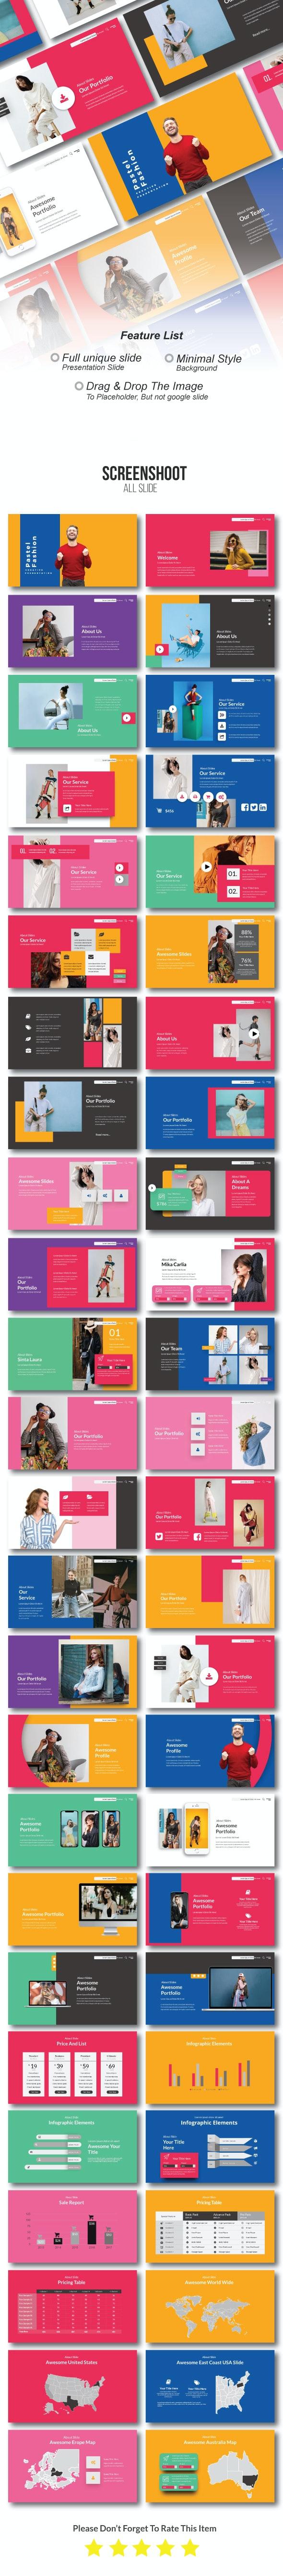 Pastel Fashion Creative Powerpoint - Creative PowerPoint Templates